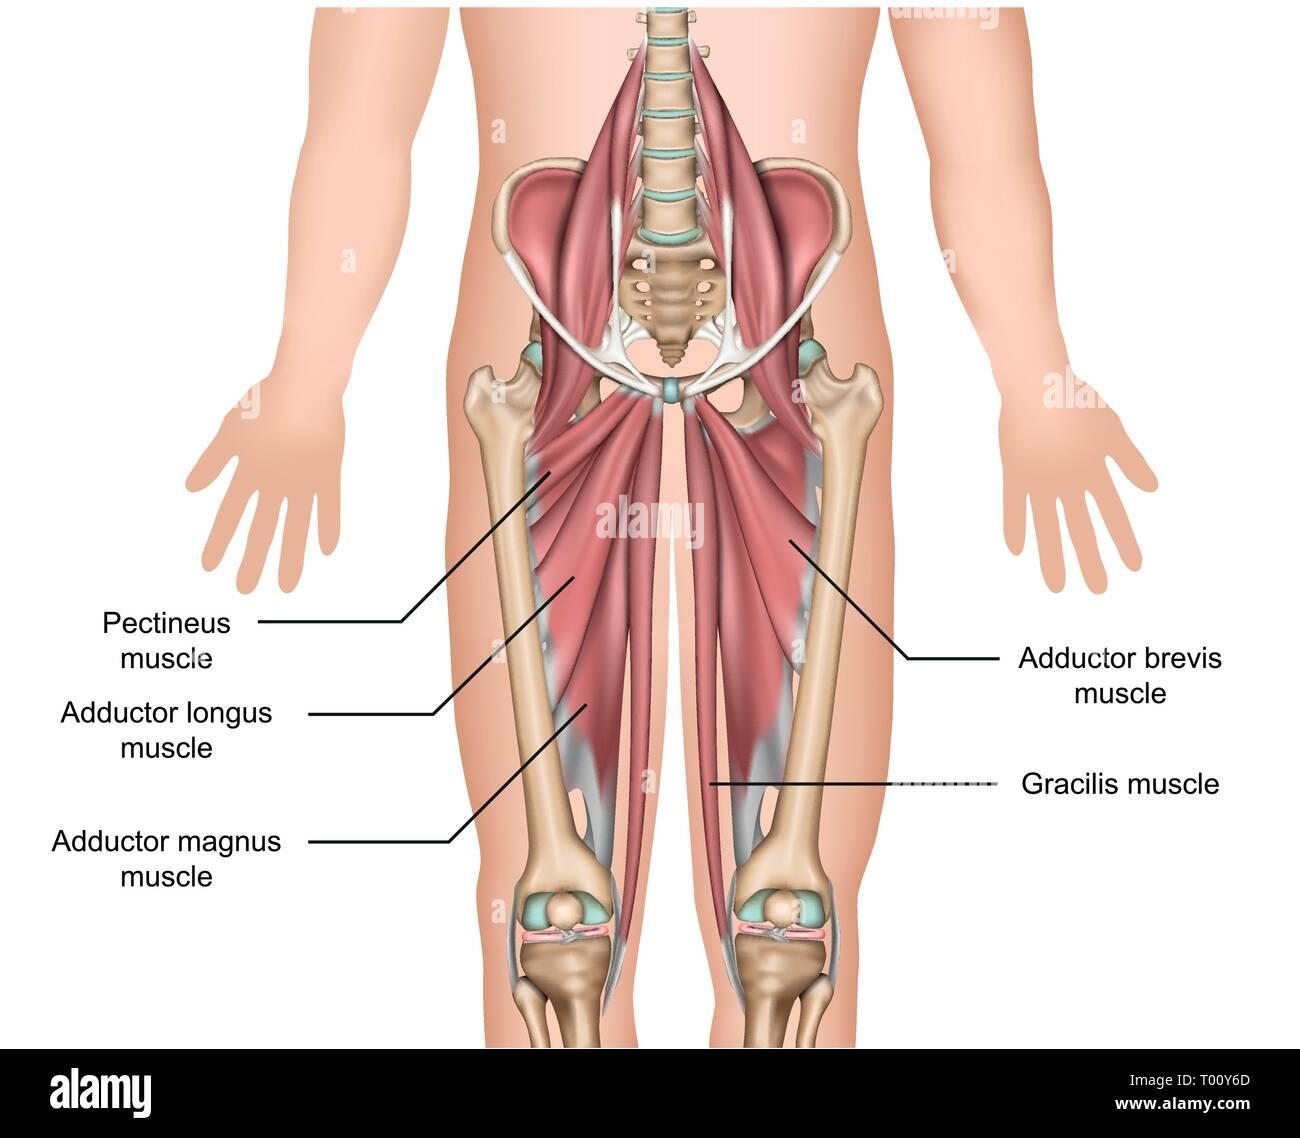 Les muscles adducteurs anatomy 3d medical vector illustration sur fond blanc Photo Stock